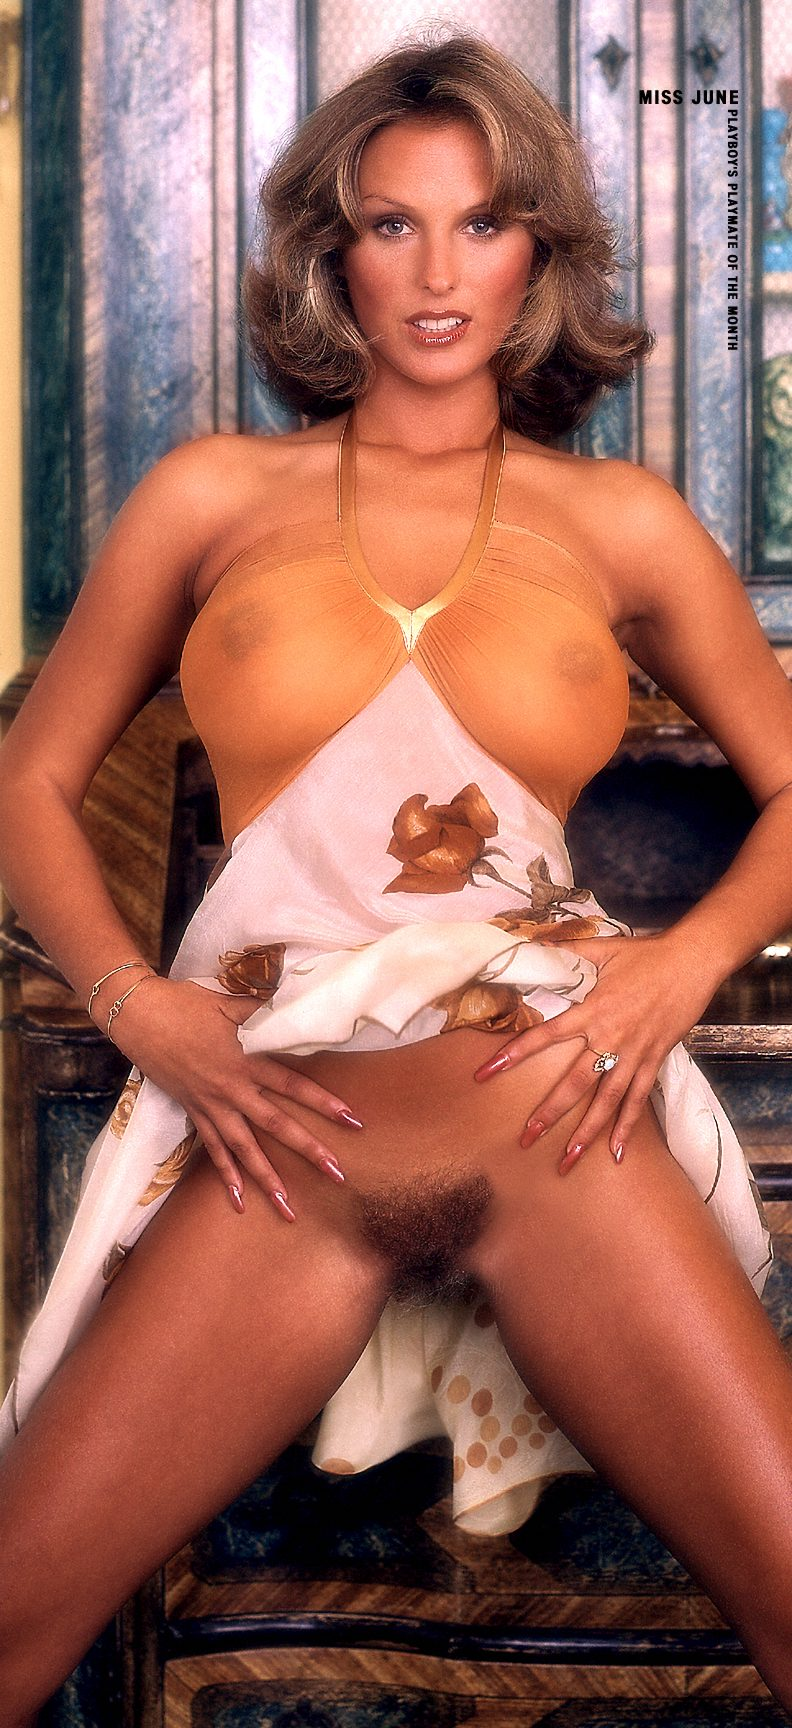 Midget anal tube